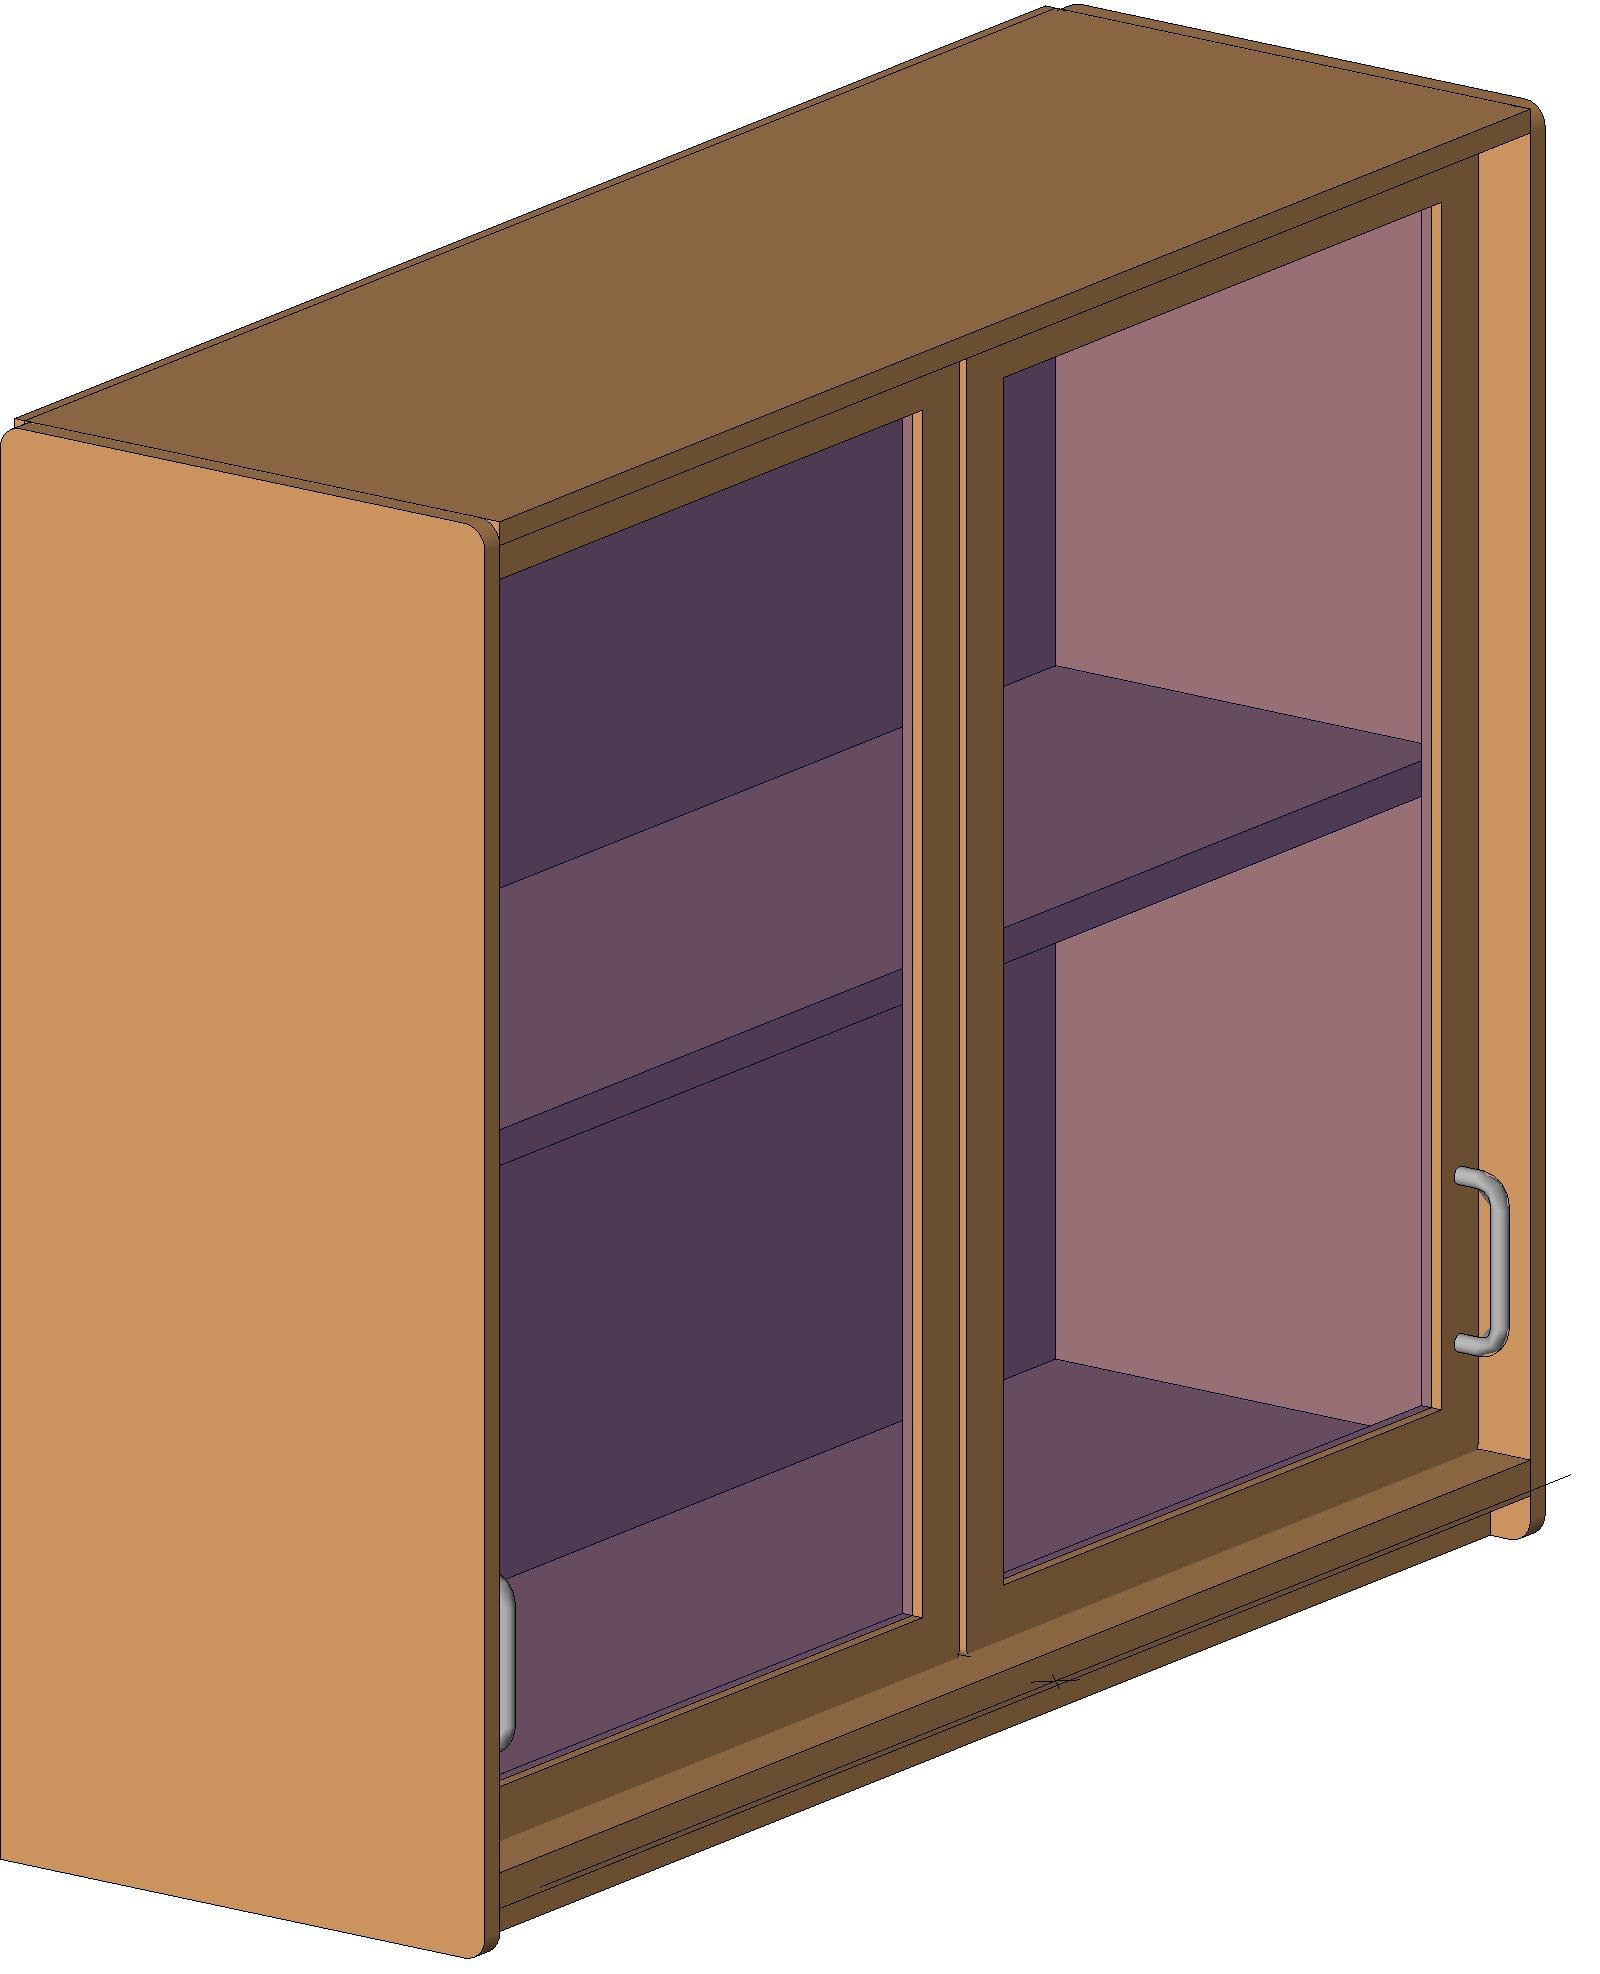 casework wall cabinets wf wm glazed sliding double door specrite designs